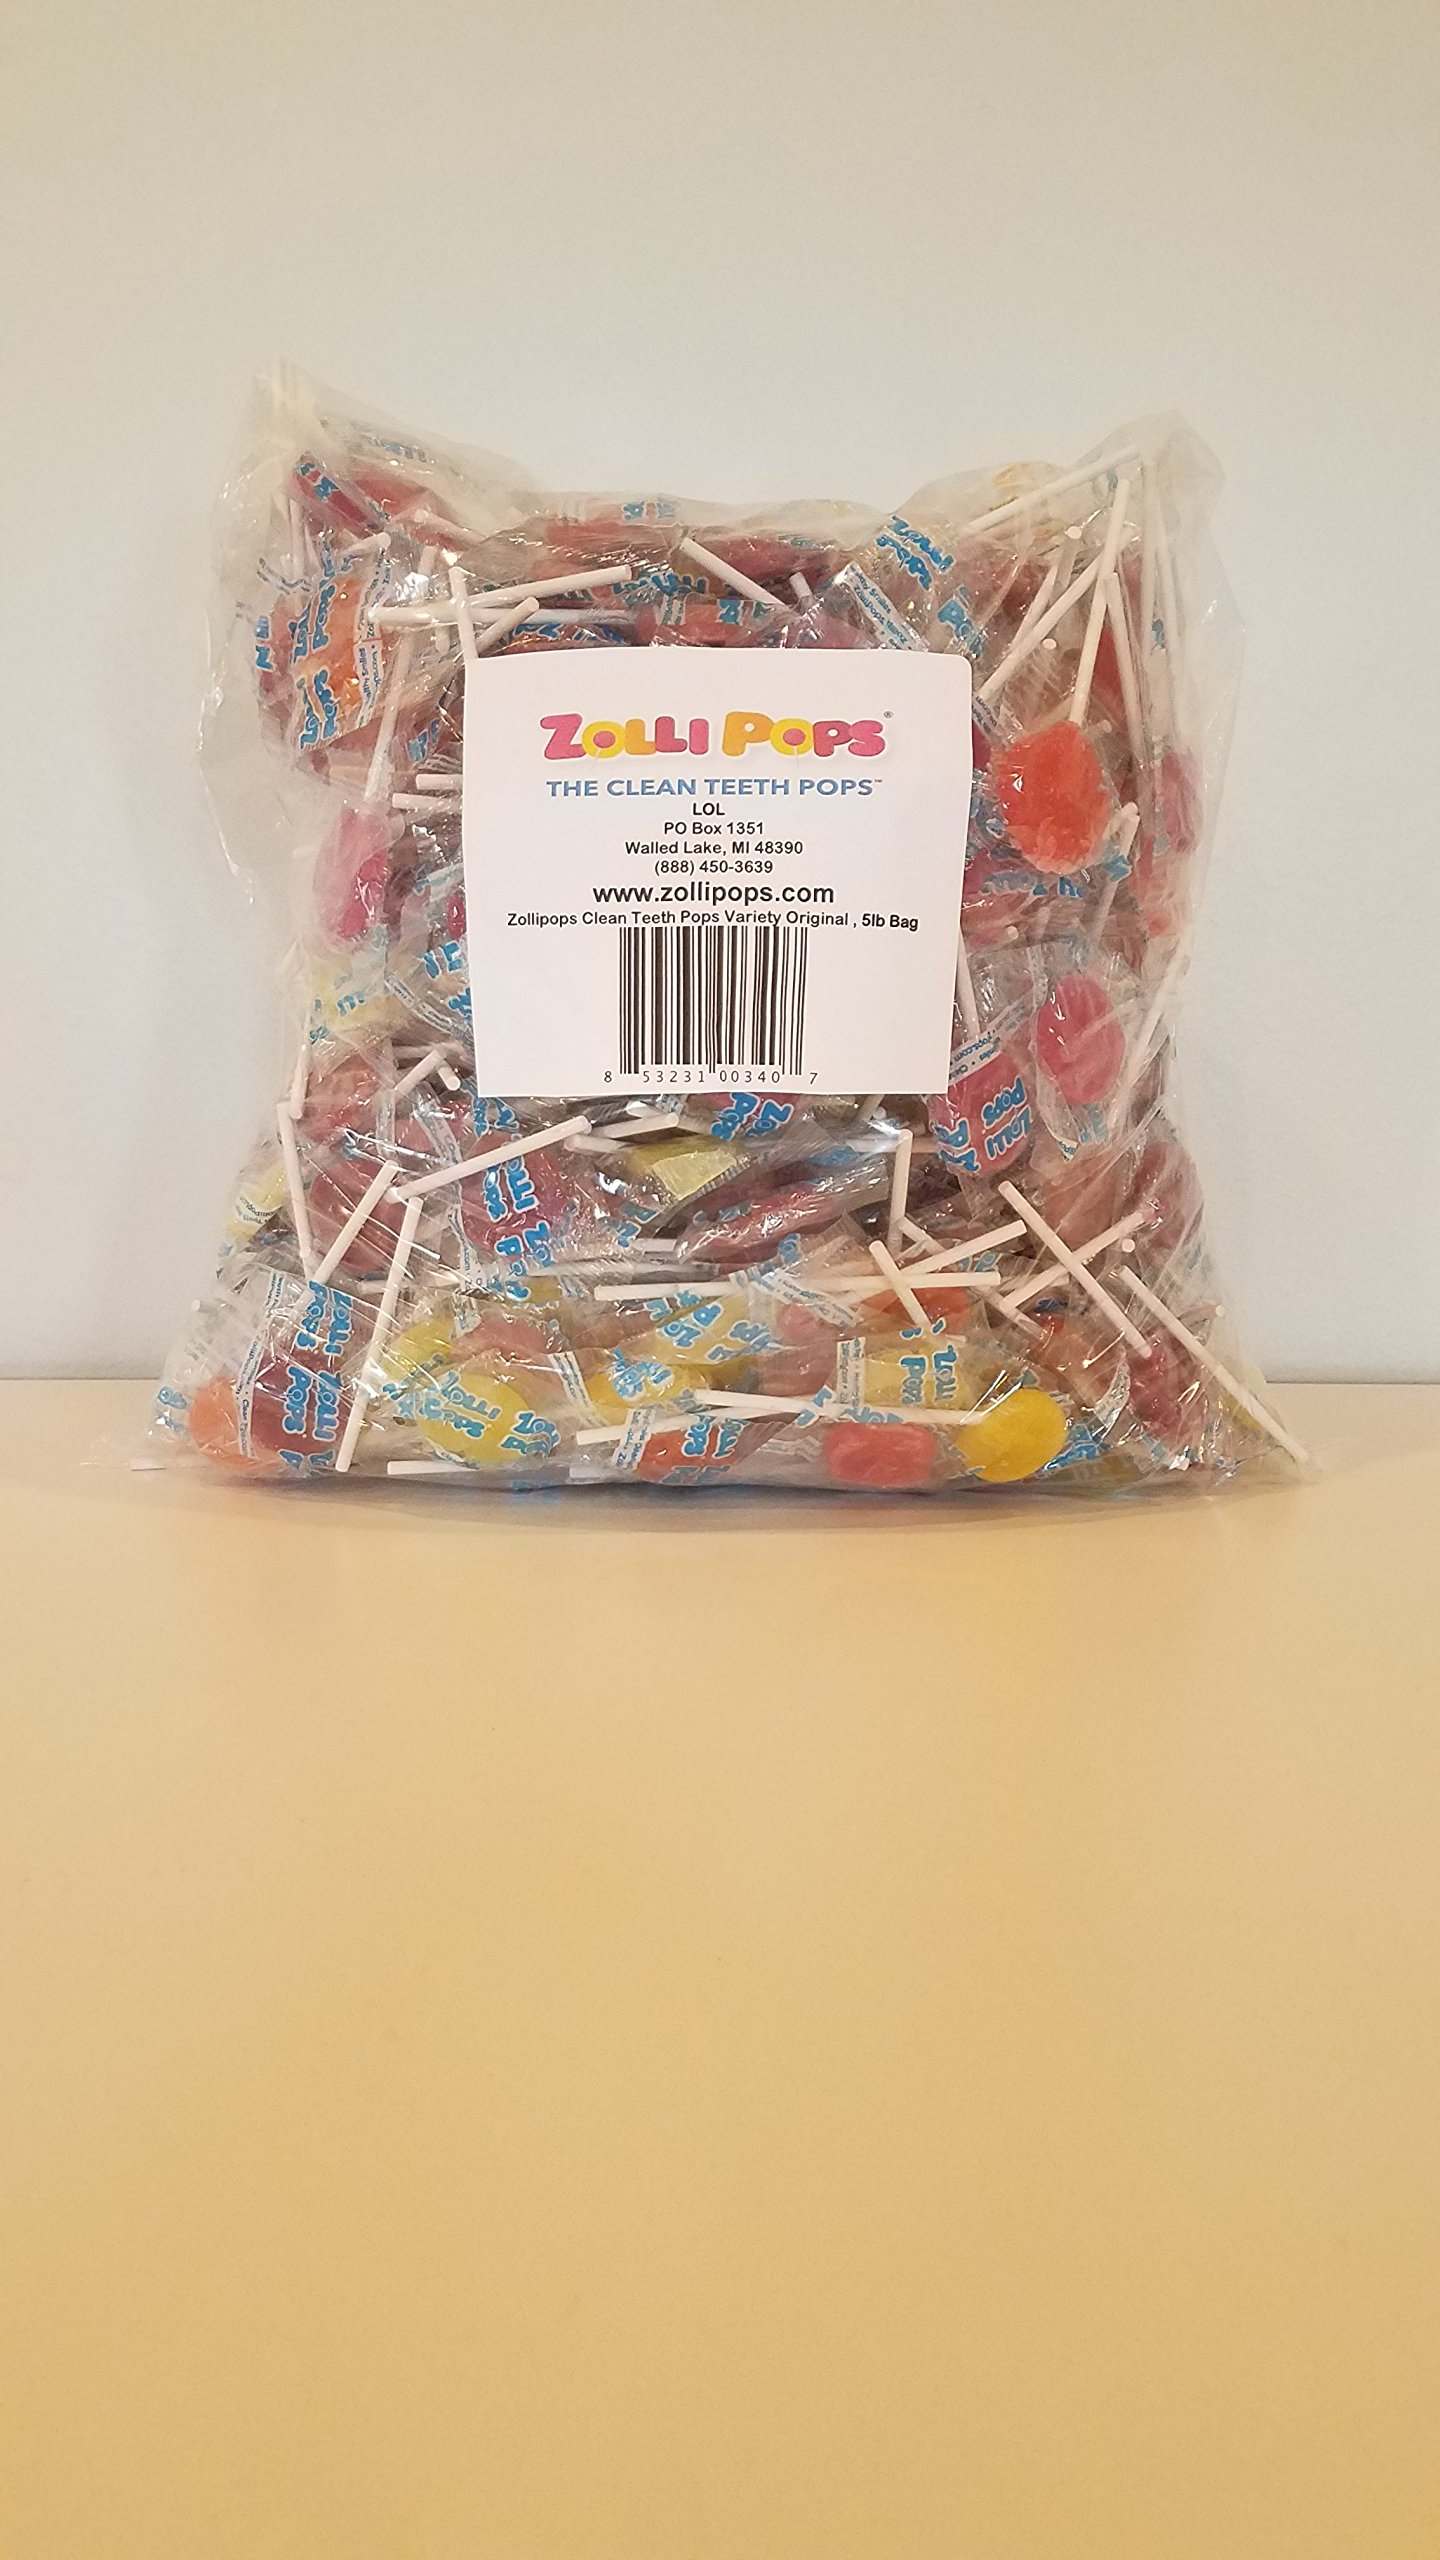 Zollipops Variety Bulk, Natural Fruit, 80 Ounce by Zollipops